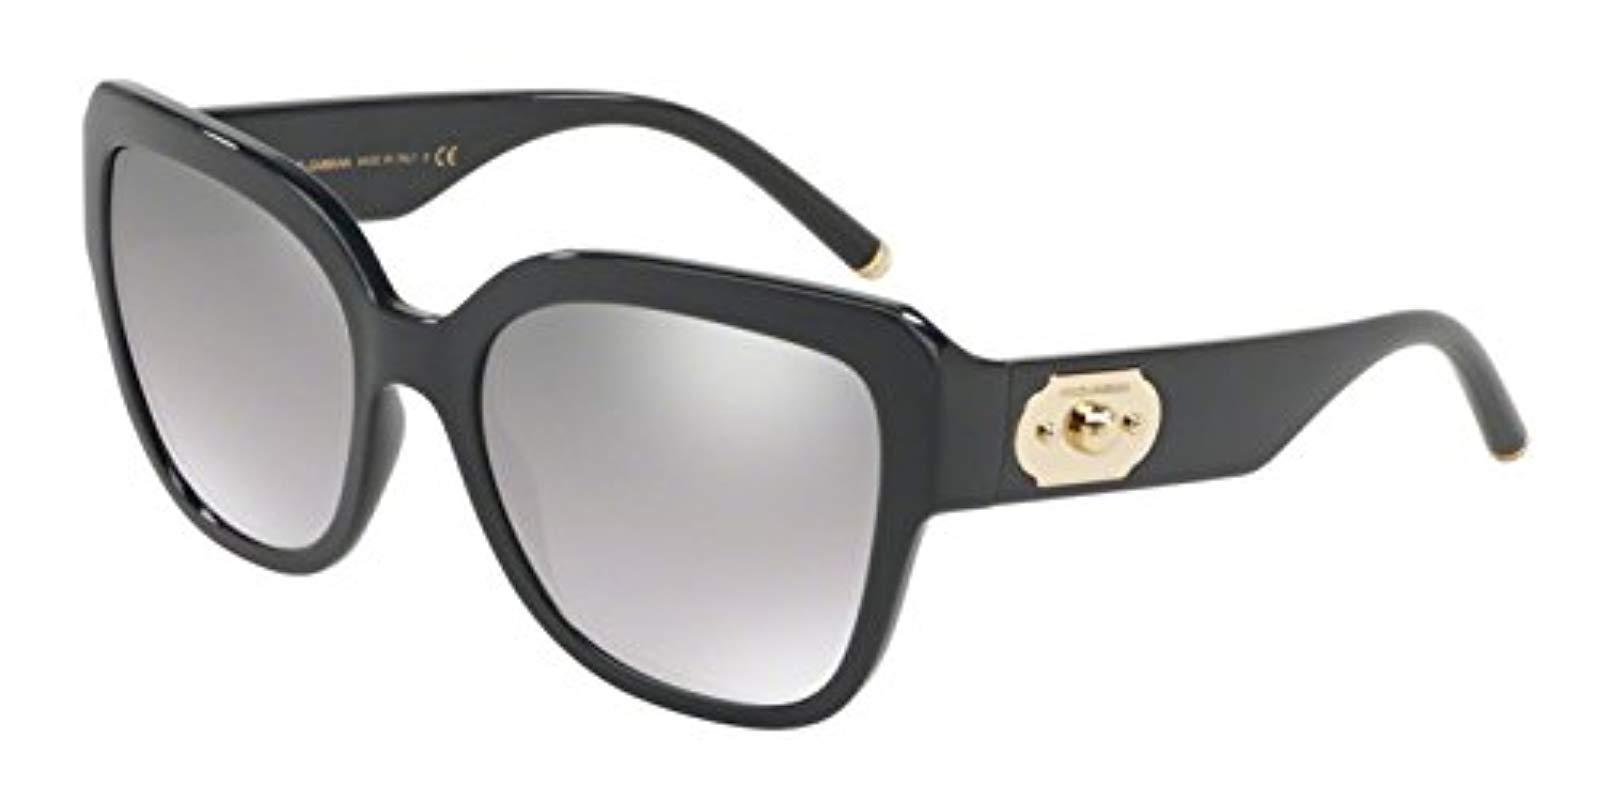 20e0d53ad00 Ray-Ban 0dg6118 Sunglasses